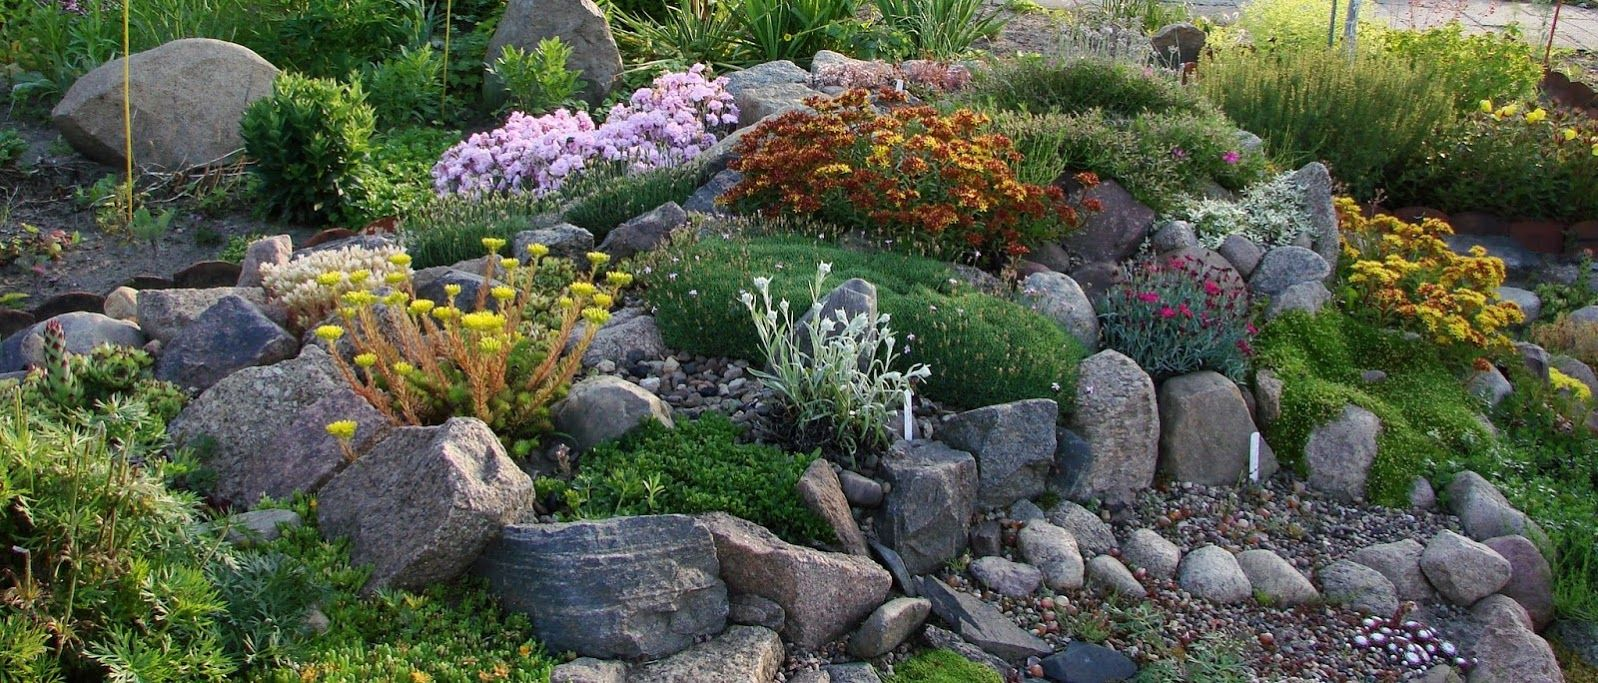 Forum Ogrodnicze Oaza Topic Skalniak I Kamienie U Piotrka 2 4 Home Vegetable Garden Garden Stones Garden Gifts